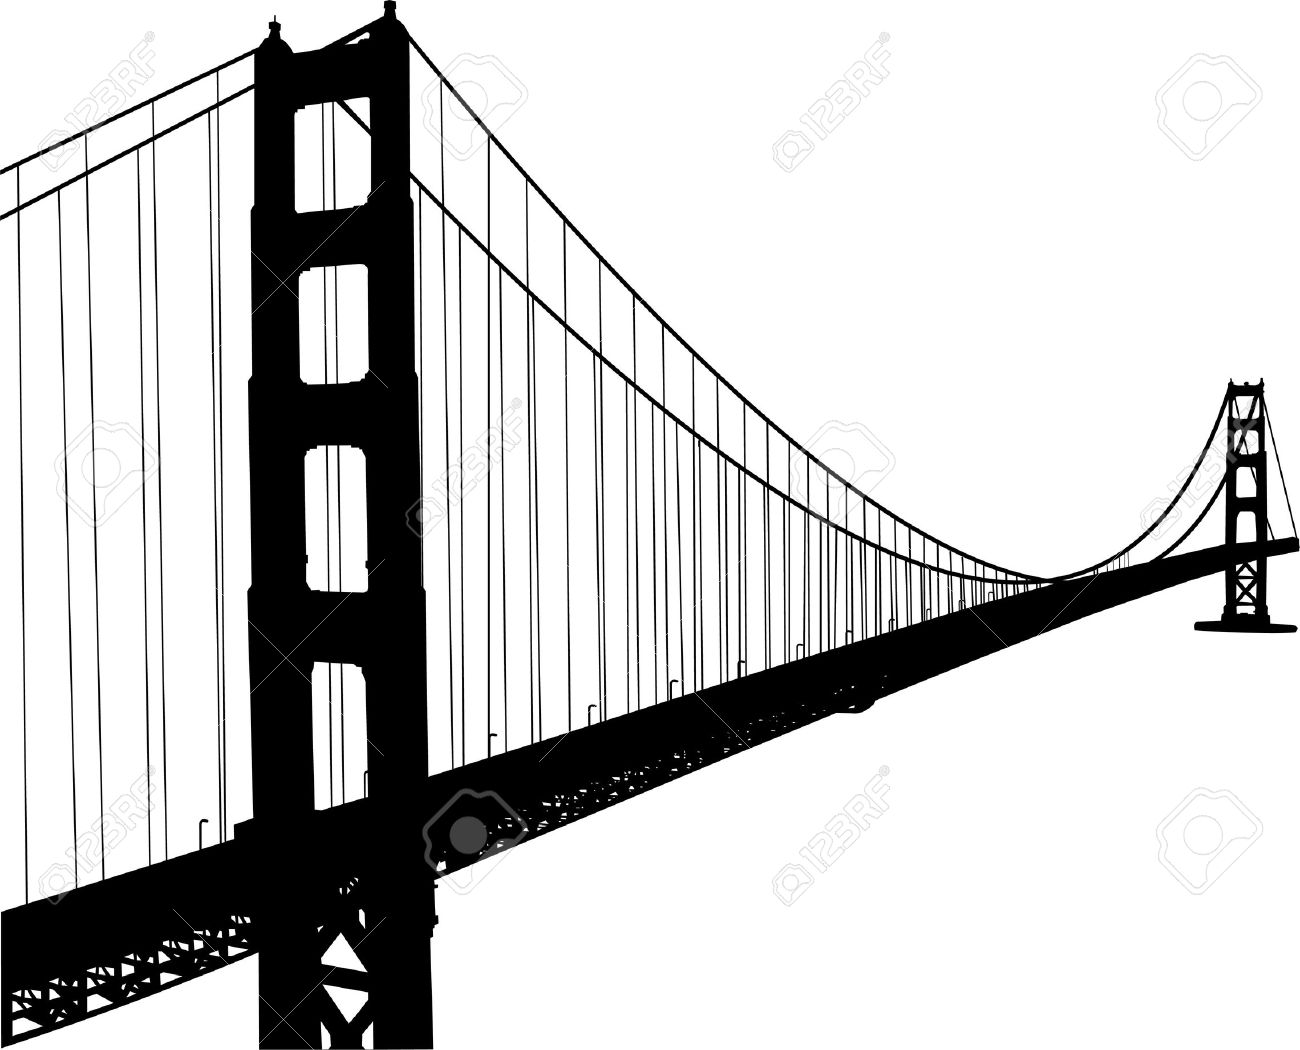 Printable coloring pages golden gate bridge - Golden Gate Bridge Silhouette Of Golden Gate Bridge Illustration